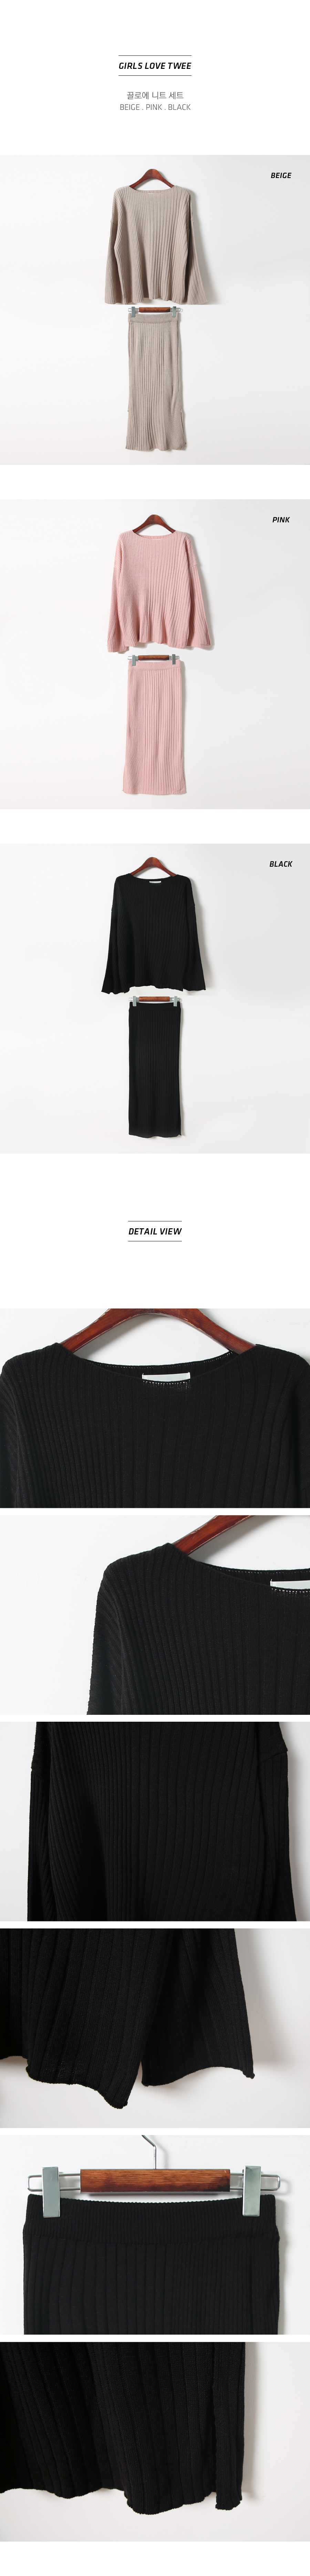 Chloe Knit Set